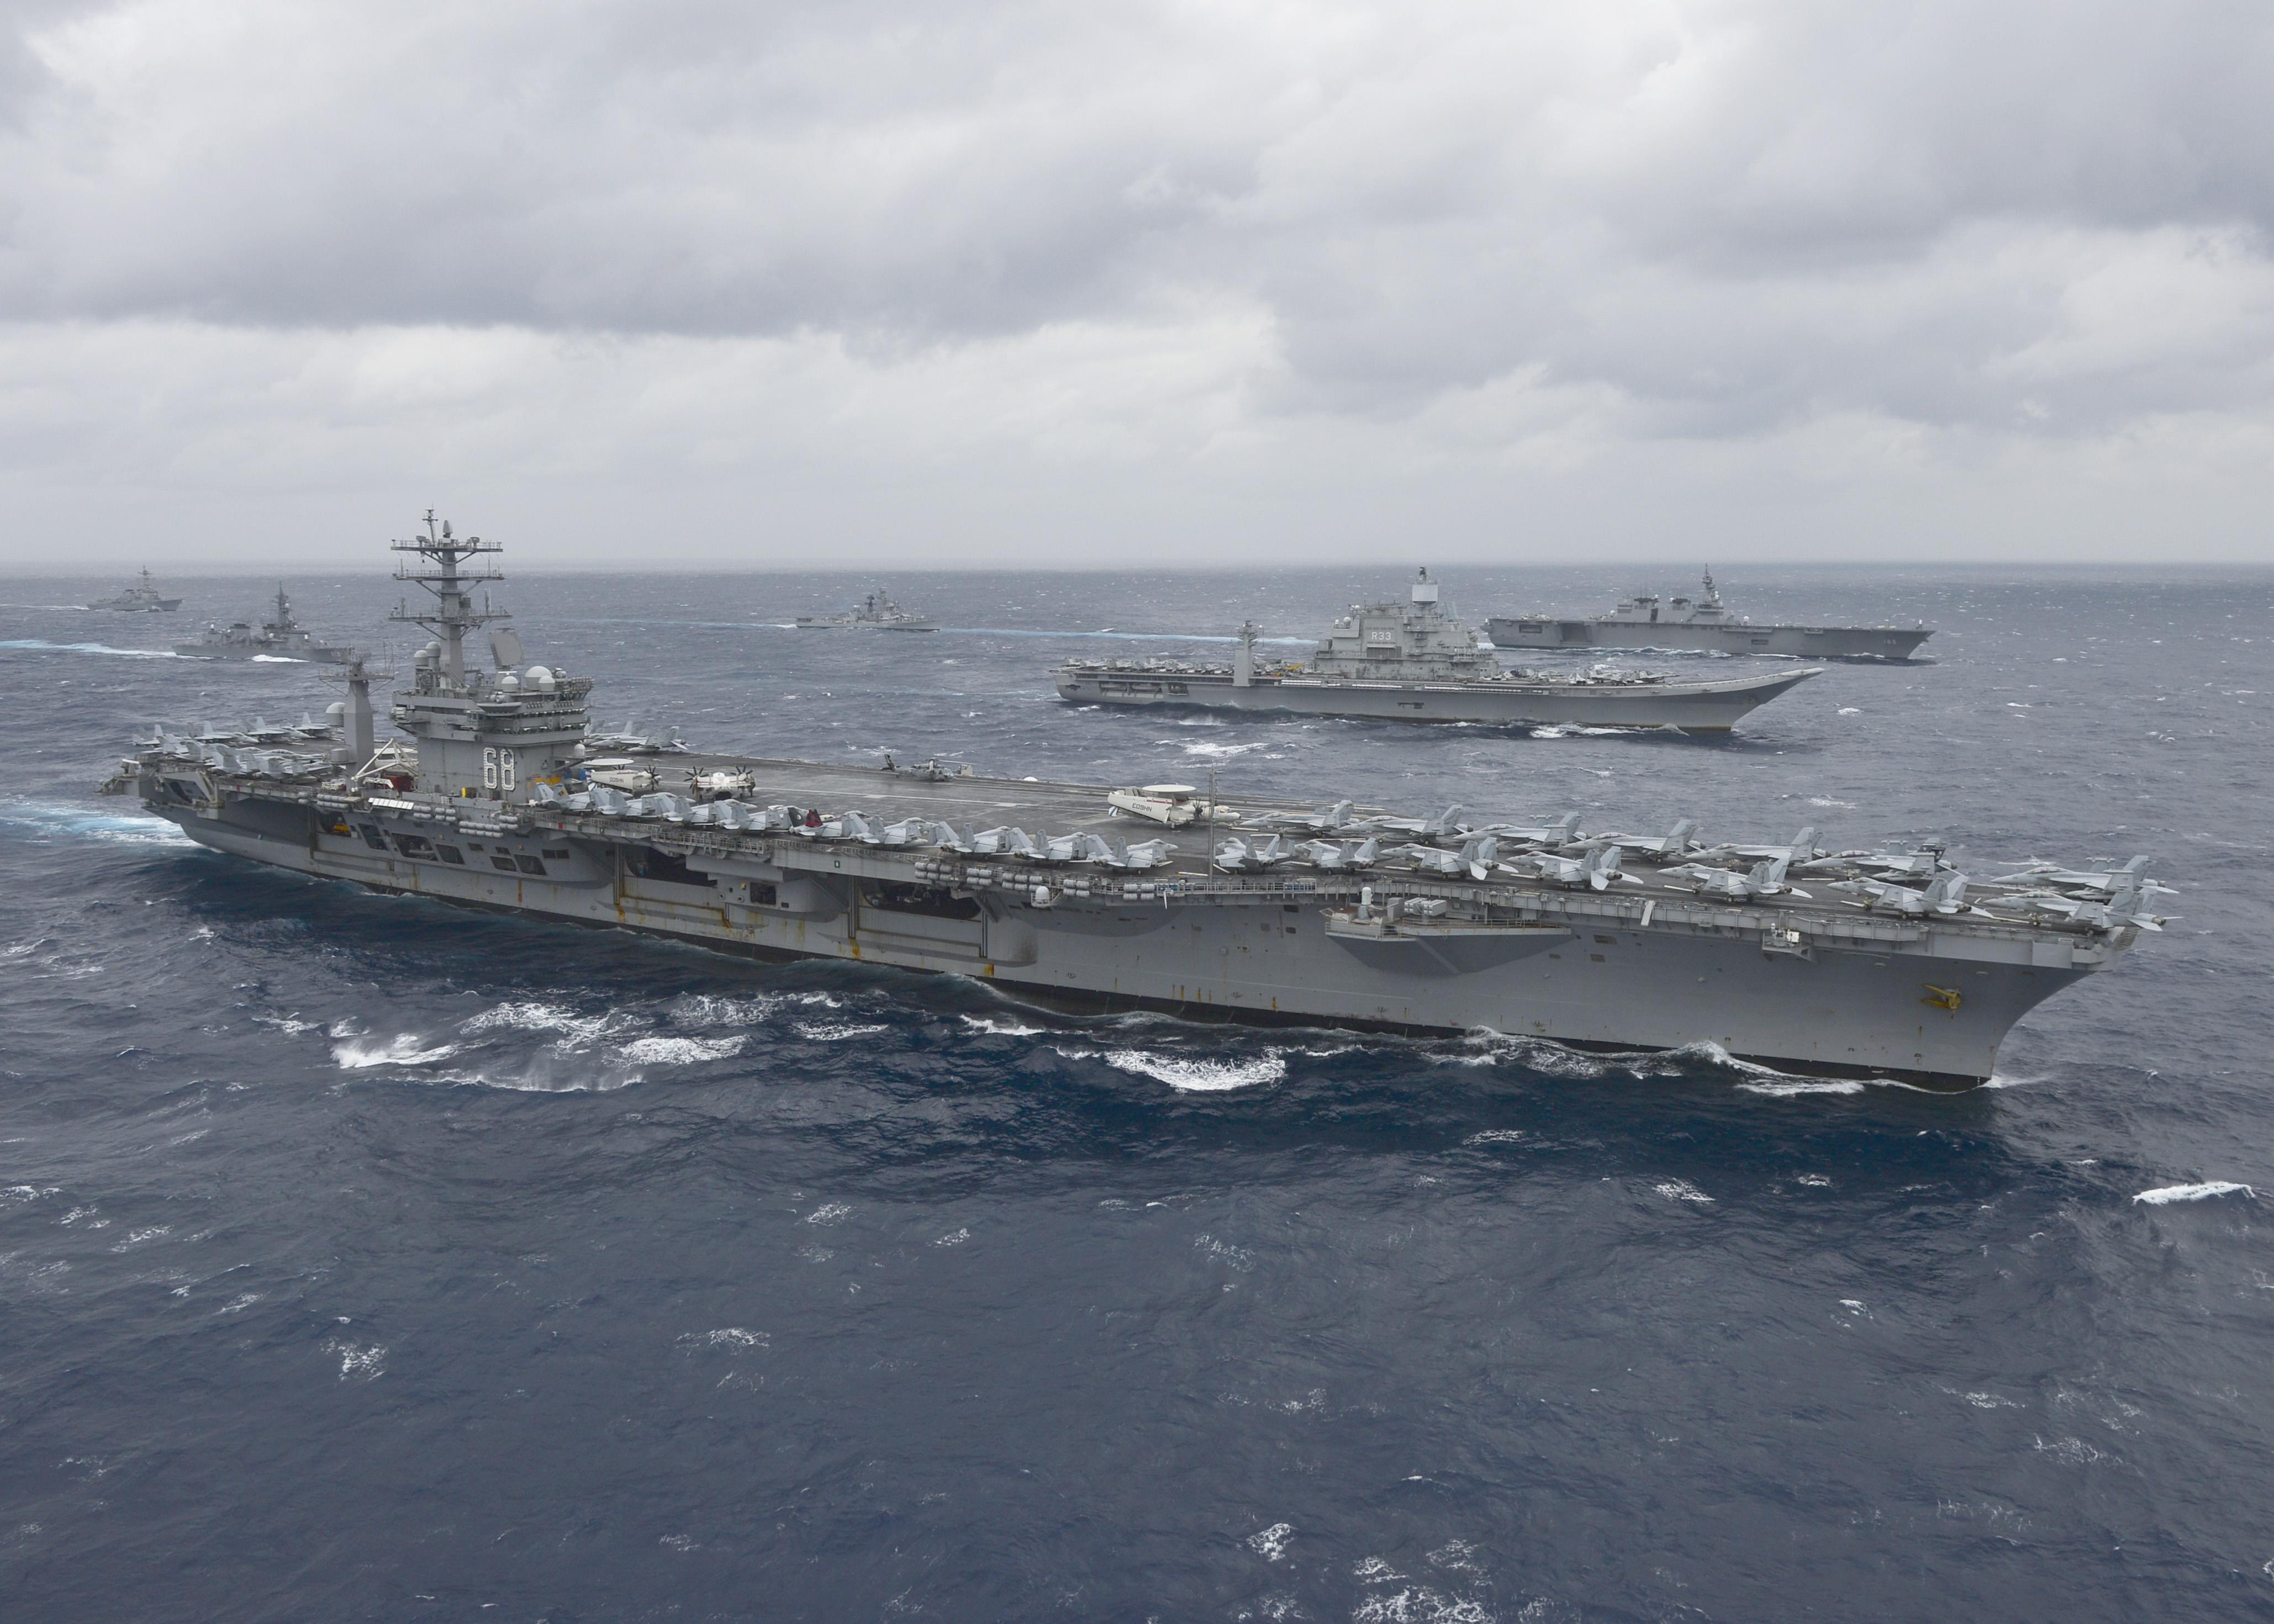 File:The aircraft carrier USS Nimitz (CVN 68) leads a